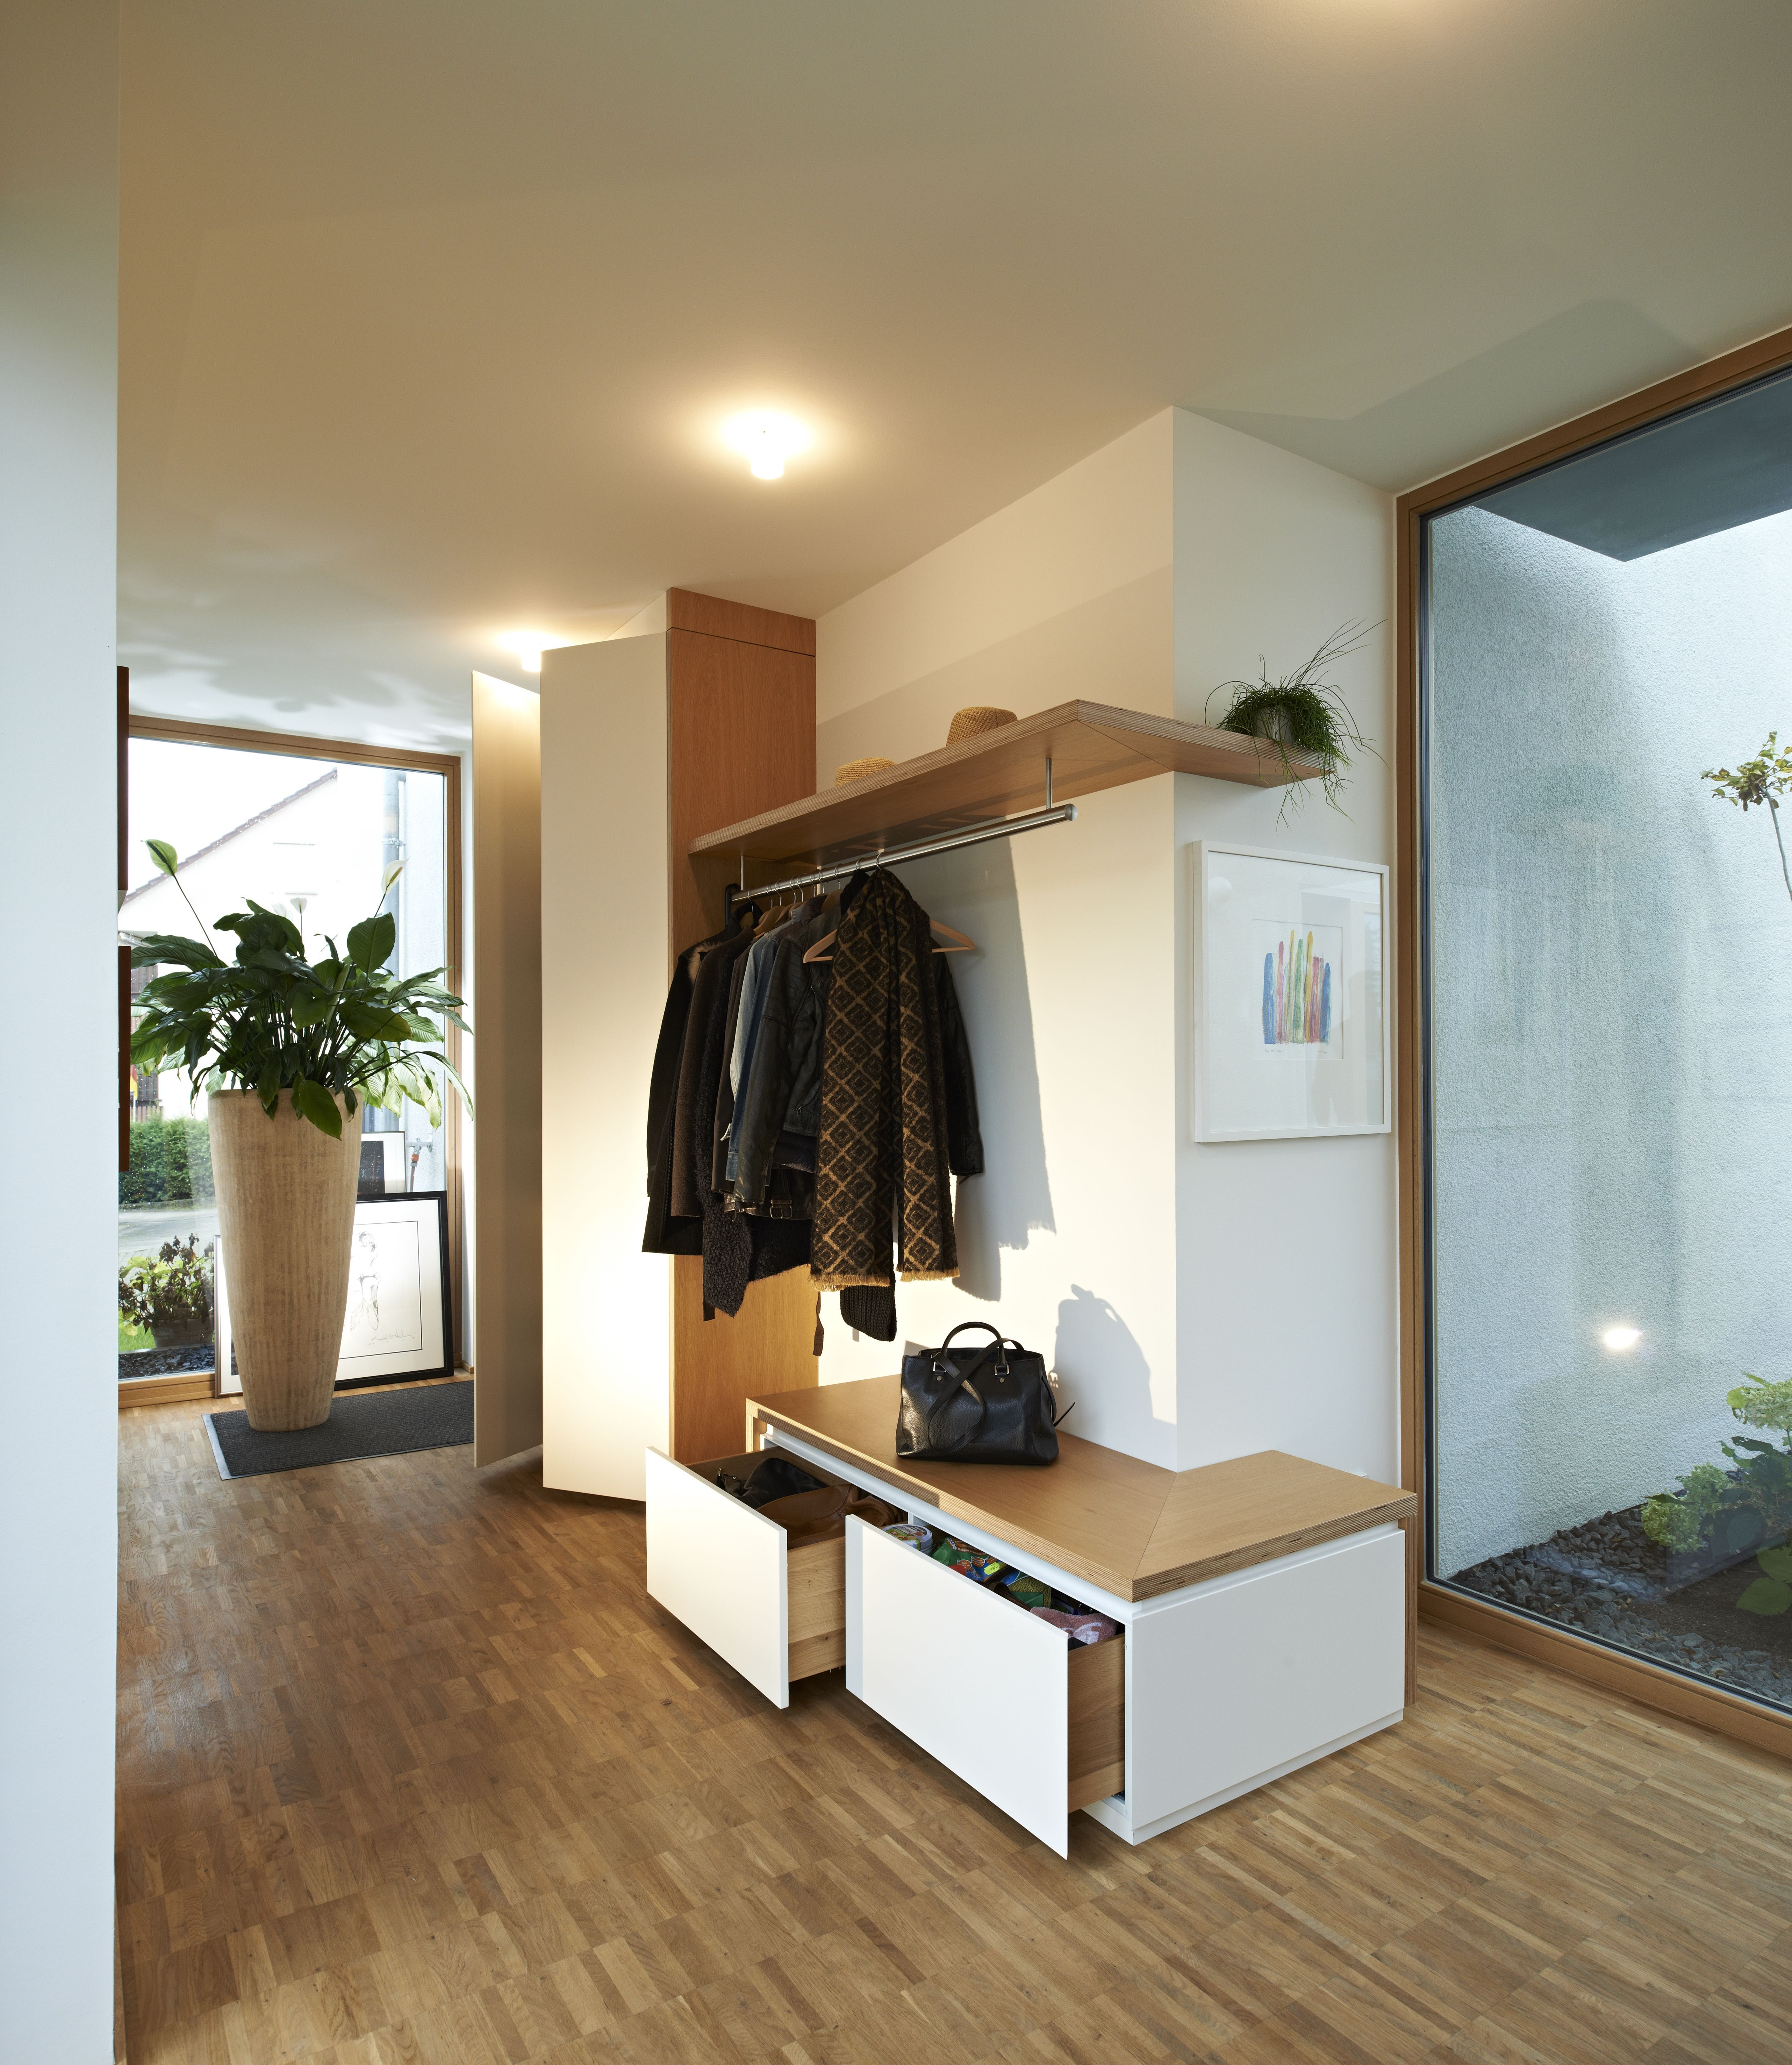 Flur 2 Idee Entree Maison Meuble Entree Entree Maison Moderne